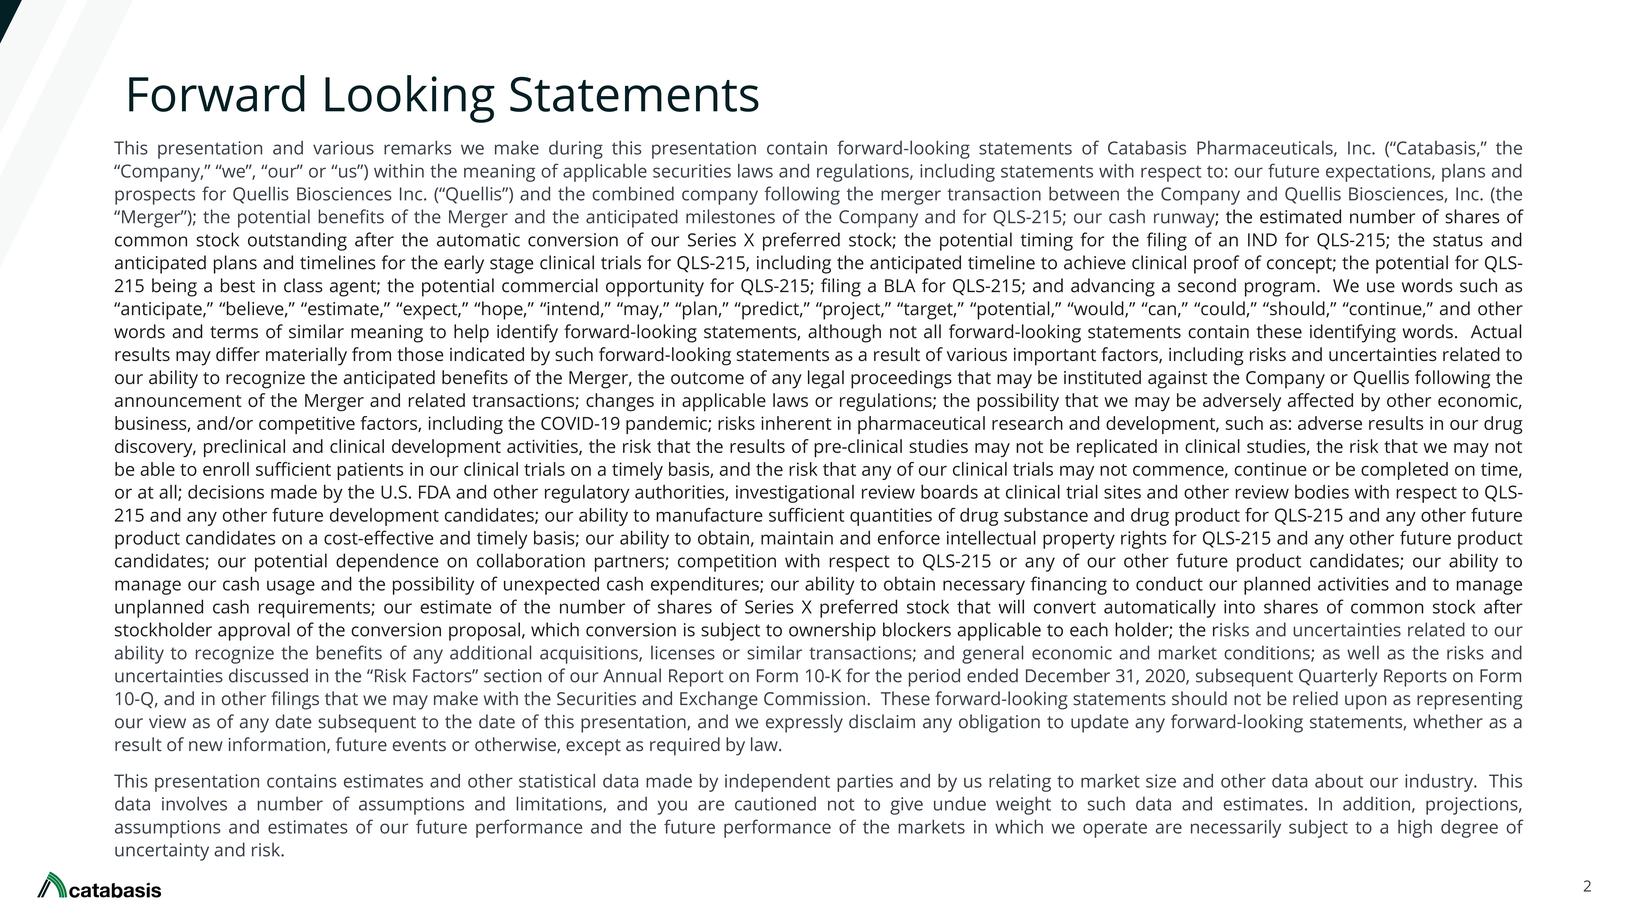 https://cdn.kscope.io/84f30625c3fb9af73f1dac4af363b397-New Microsoft Word Document_catabasis corporate presentationpage001junpage021_page002.jpg